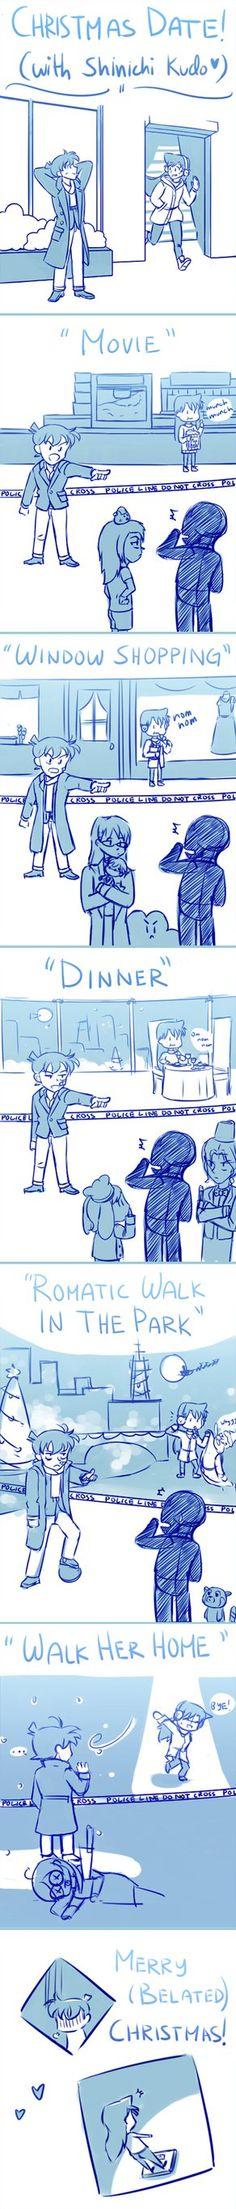 Christmas Date with Shinichi xD